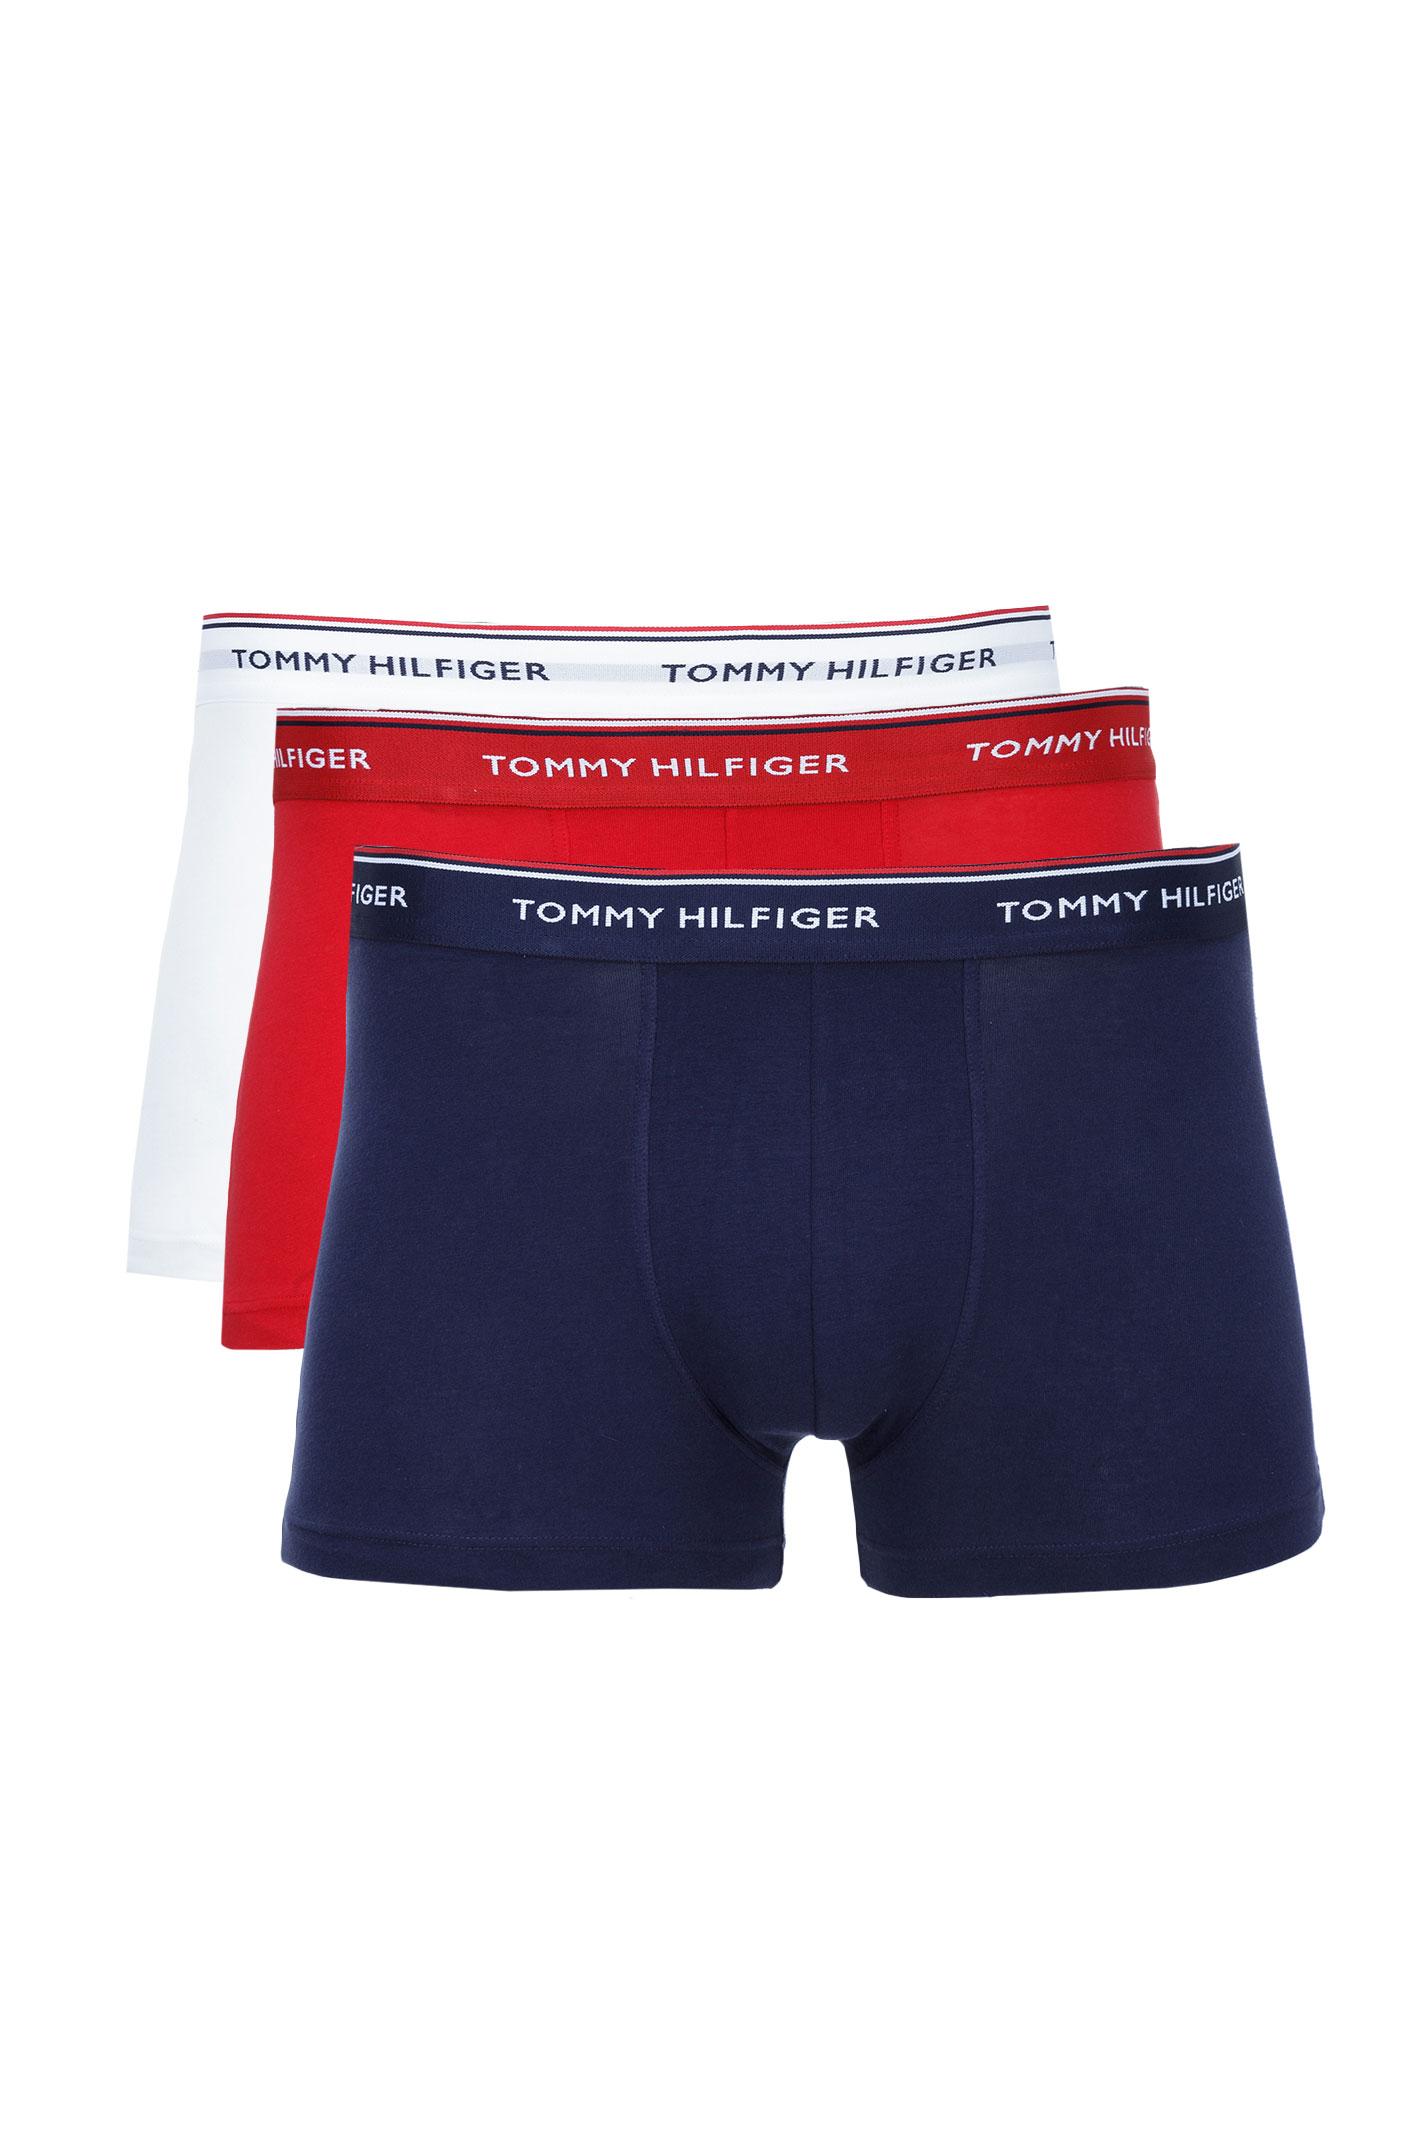 premium essentials 3 pack boxer shorts tommy hilfiger white boxer shorts. Black Bedroom Furniture Sets. Home Design Ideas